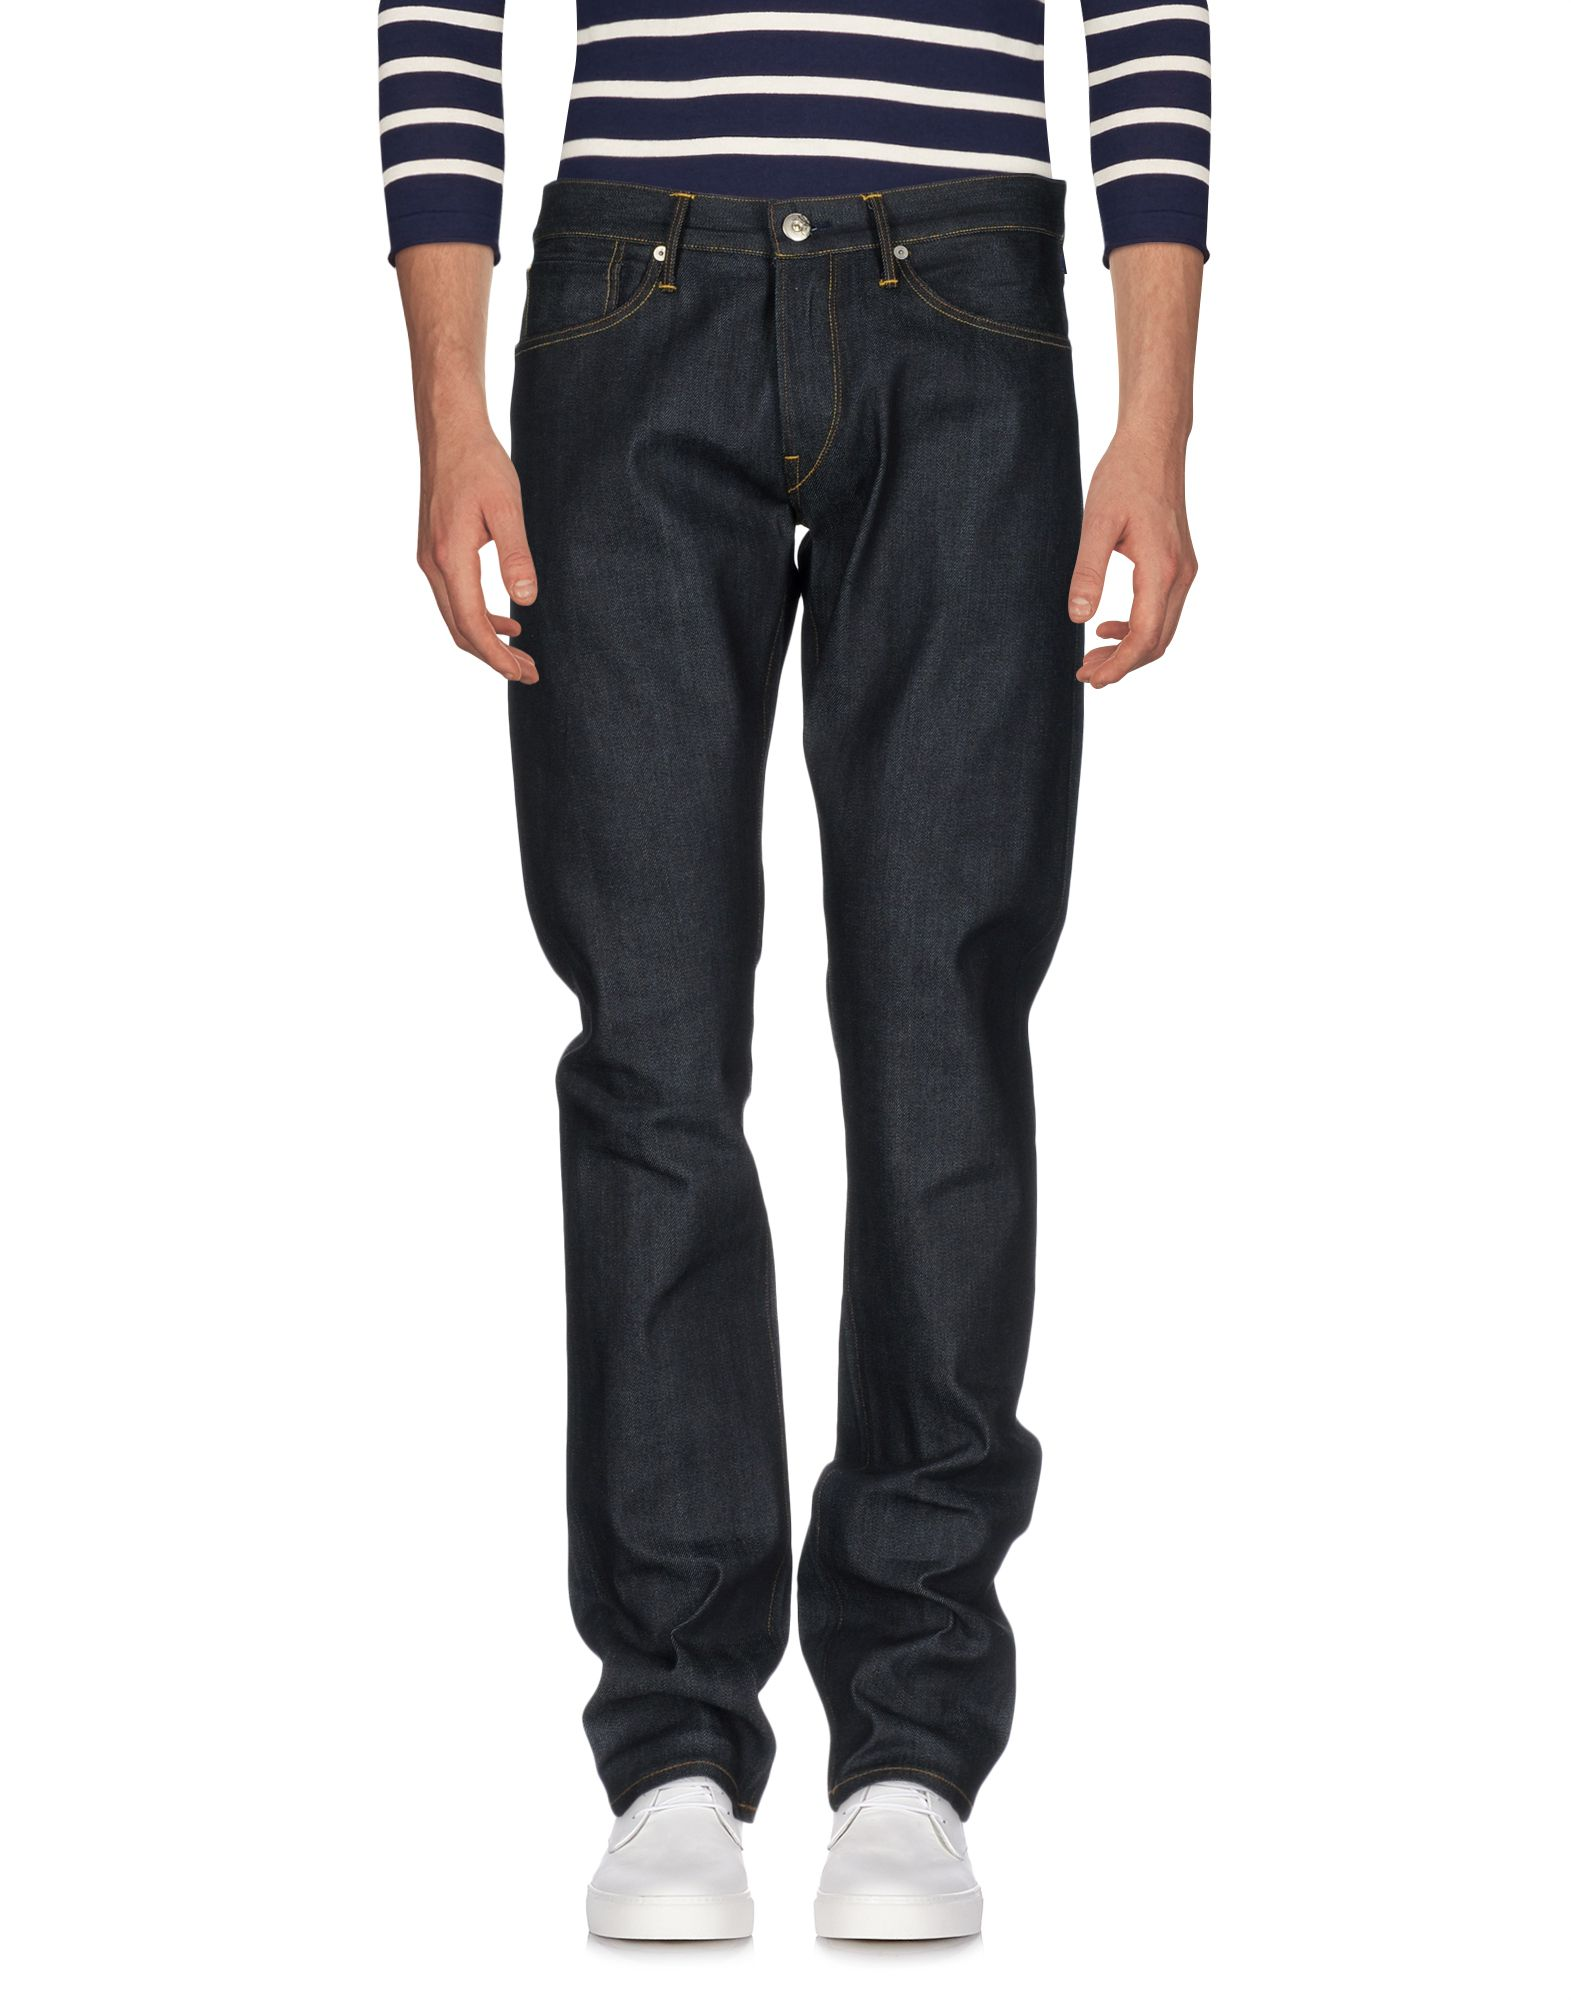 Pantaloni Jeans 3X1 Uomo - Acquista online su